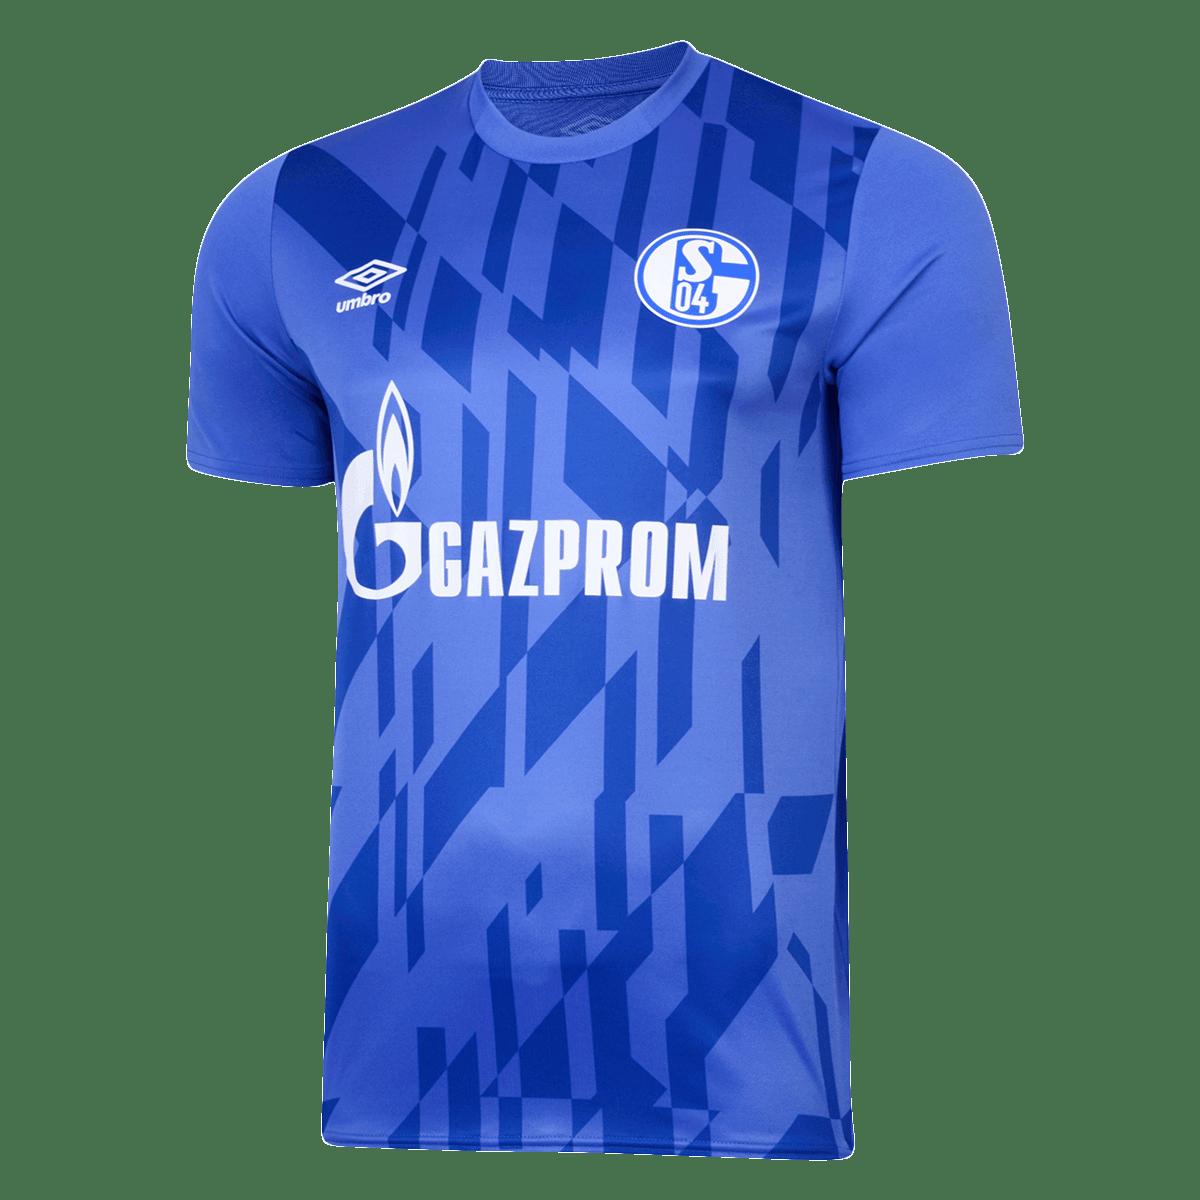 Umbro FC Schalke 04 Aufwärmtrikot Warm Up blau